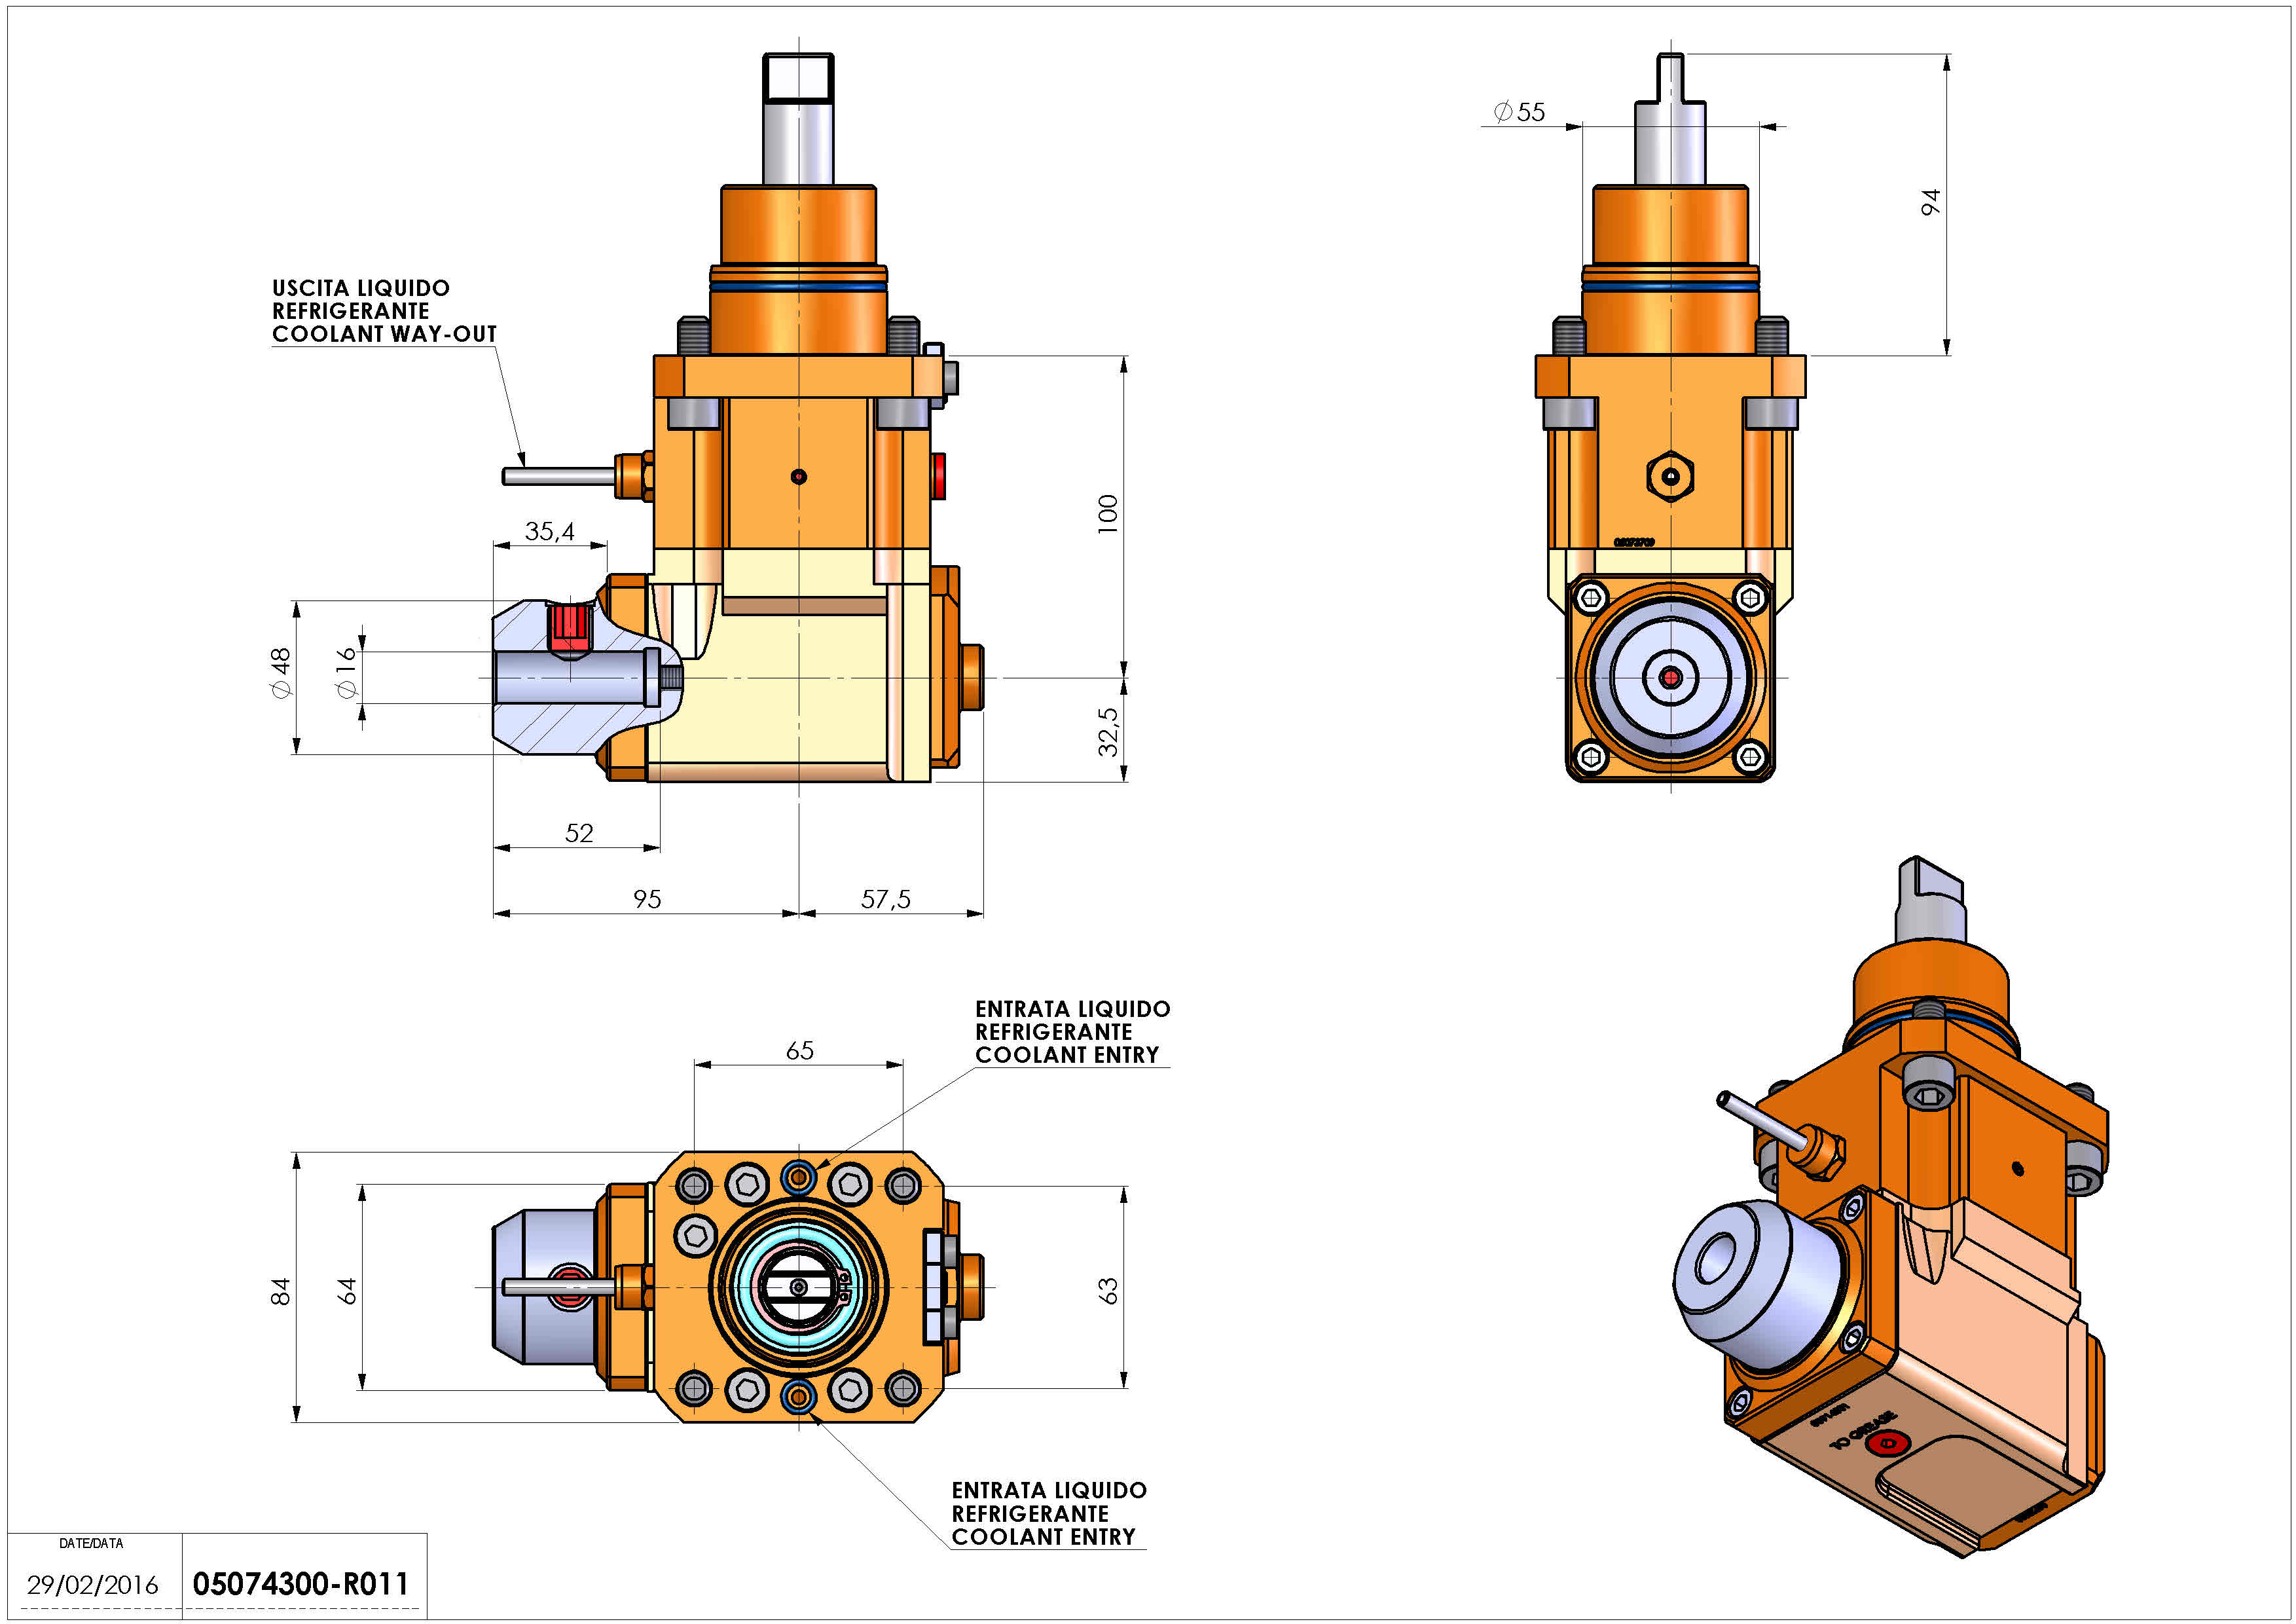 Technical image - LT-A D55 WELDON-16 LR H100 BI.